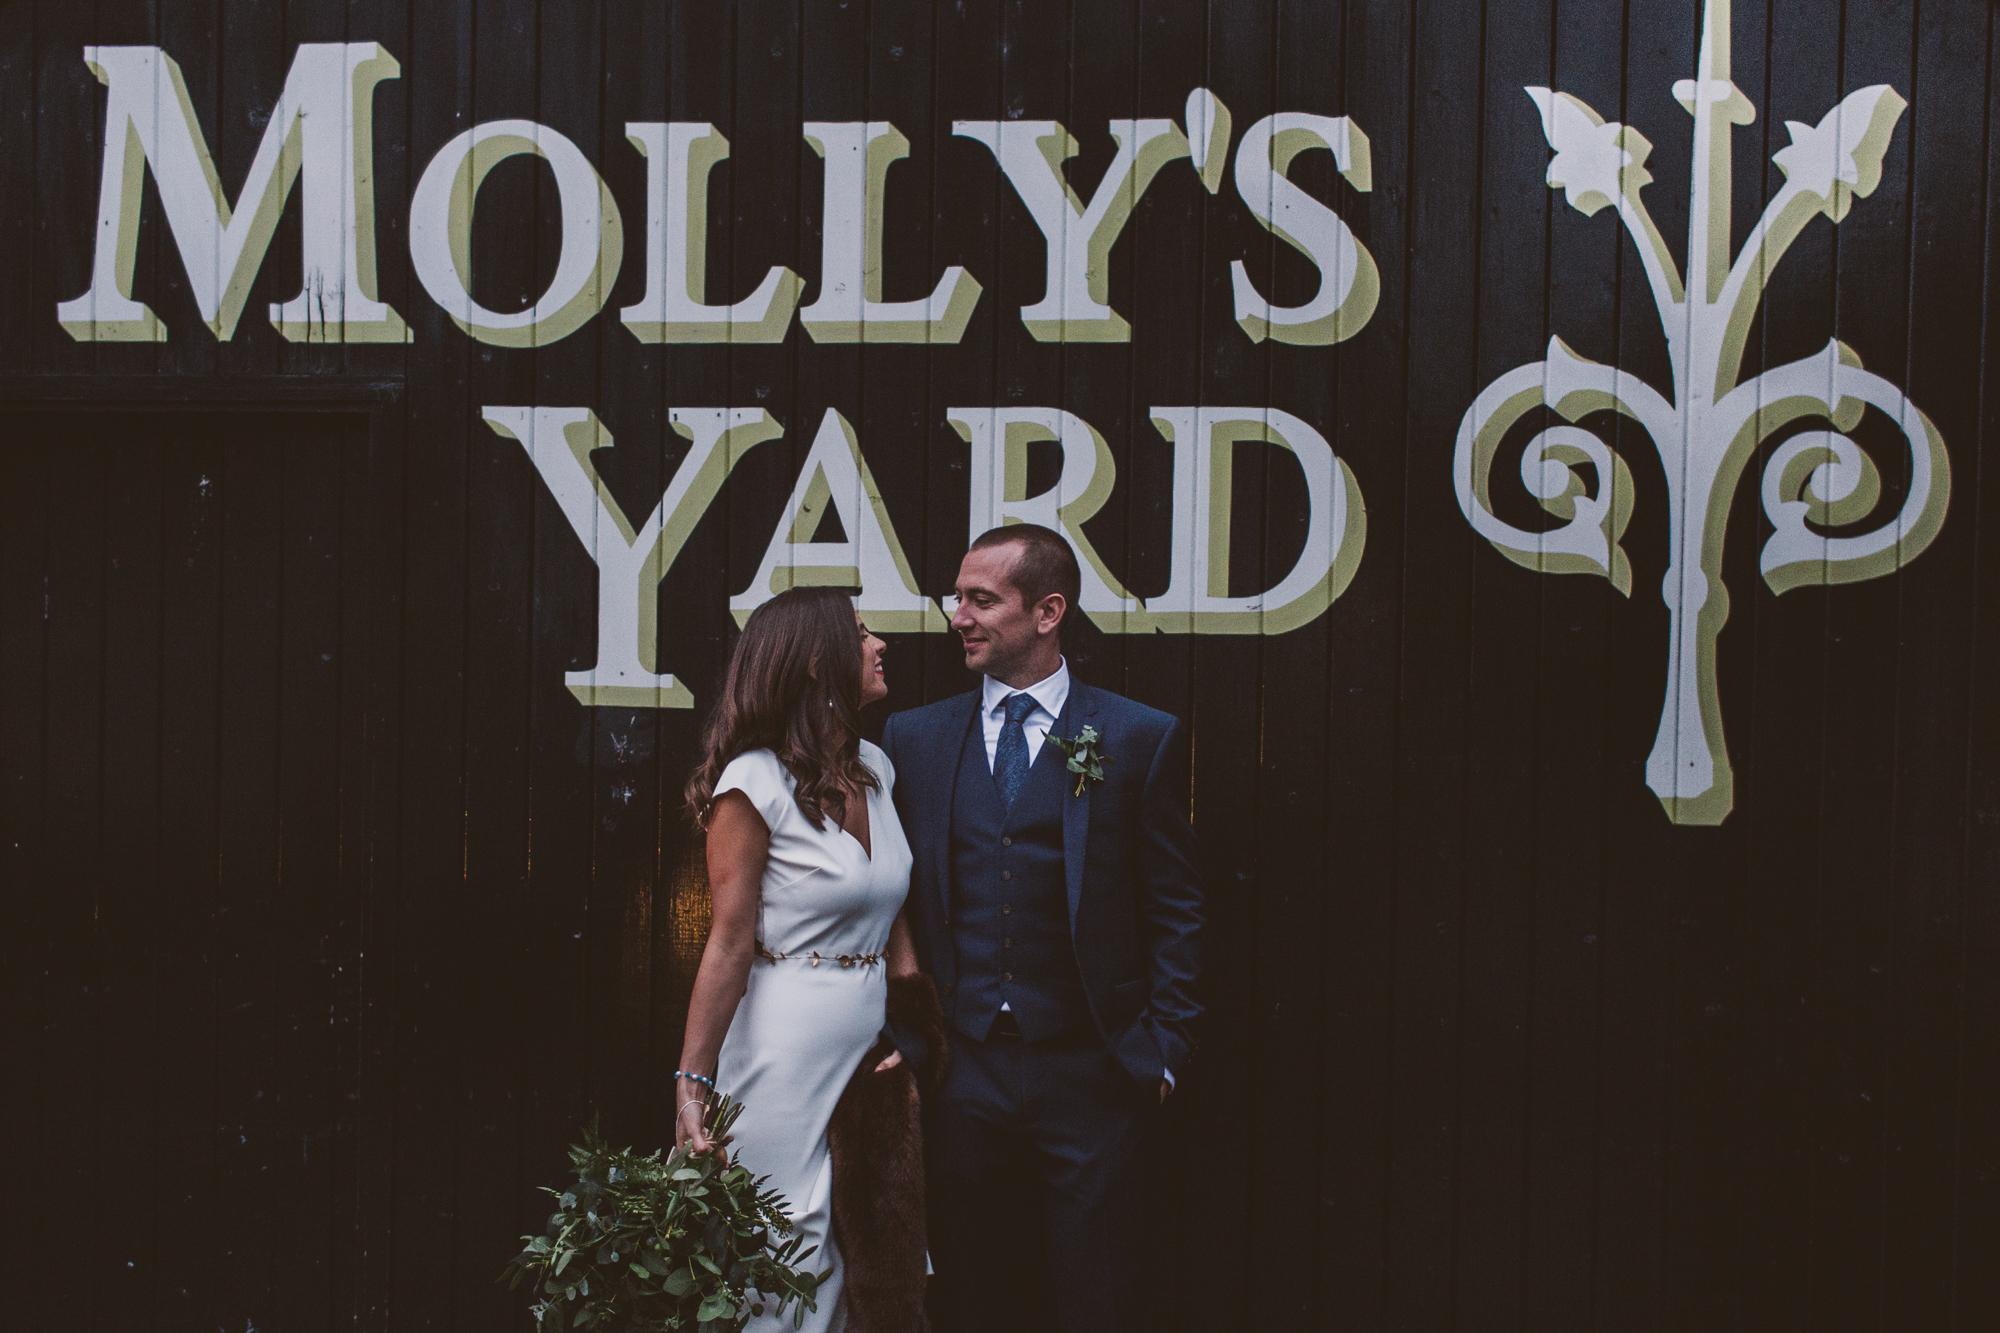 City_Centre_northern_ireland_wedding_inspire_weddings_21.jpg